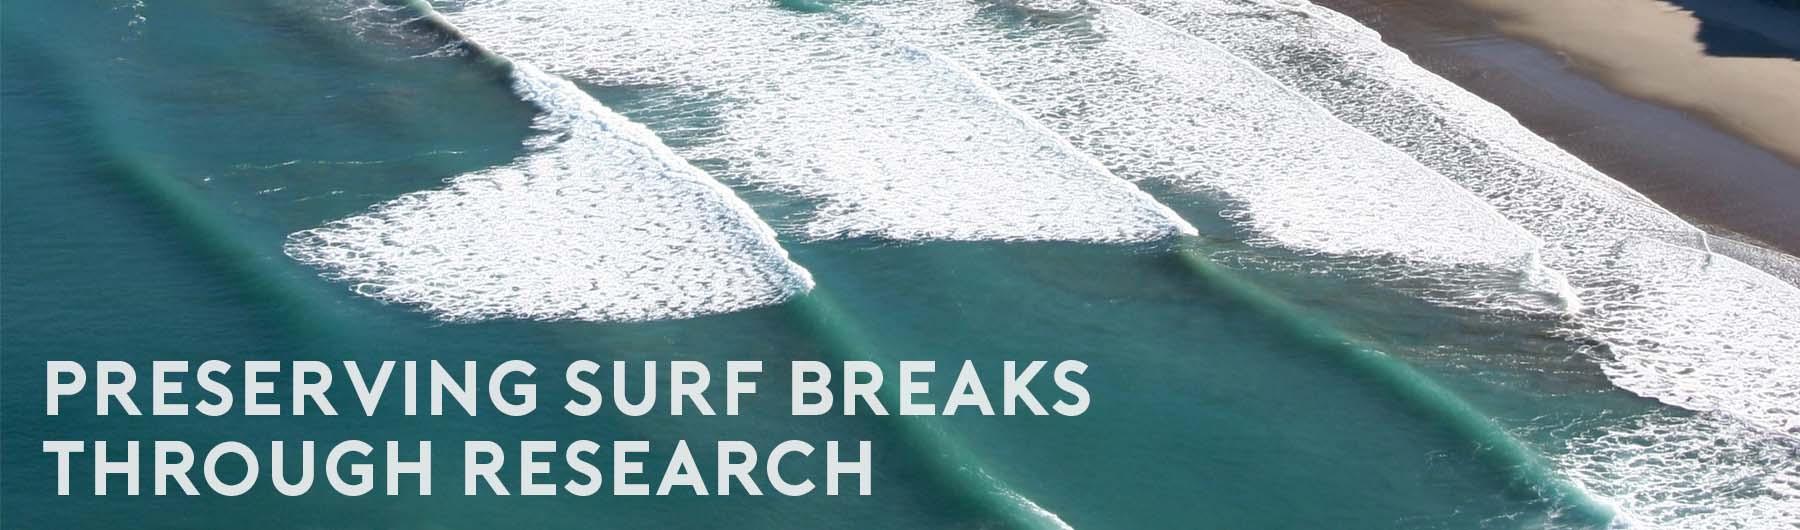 surf_break_research_data_slider_2